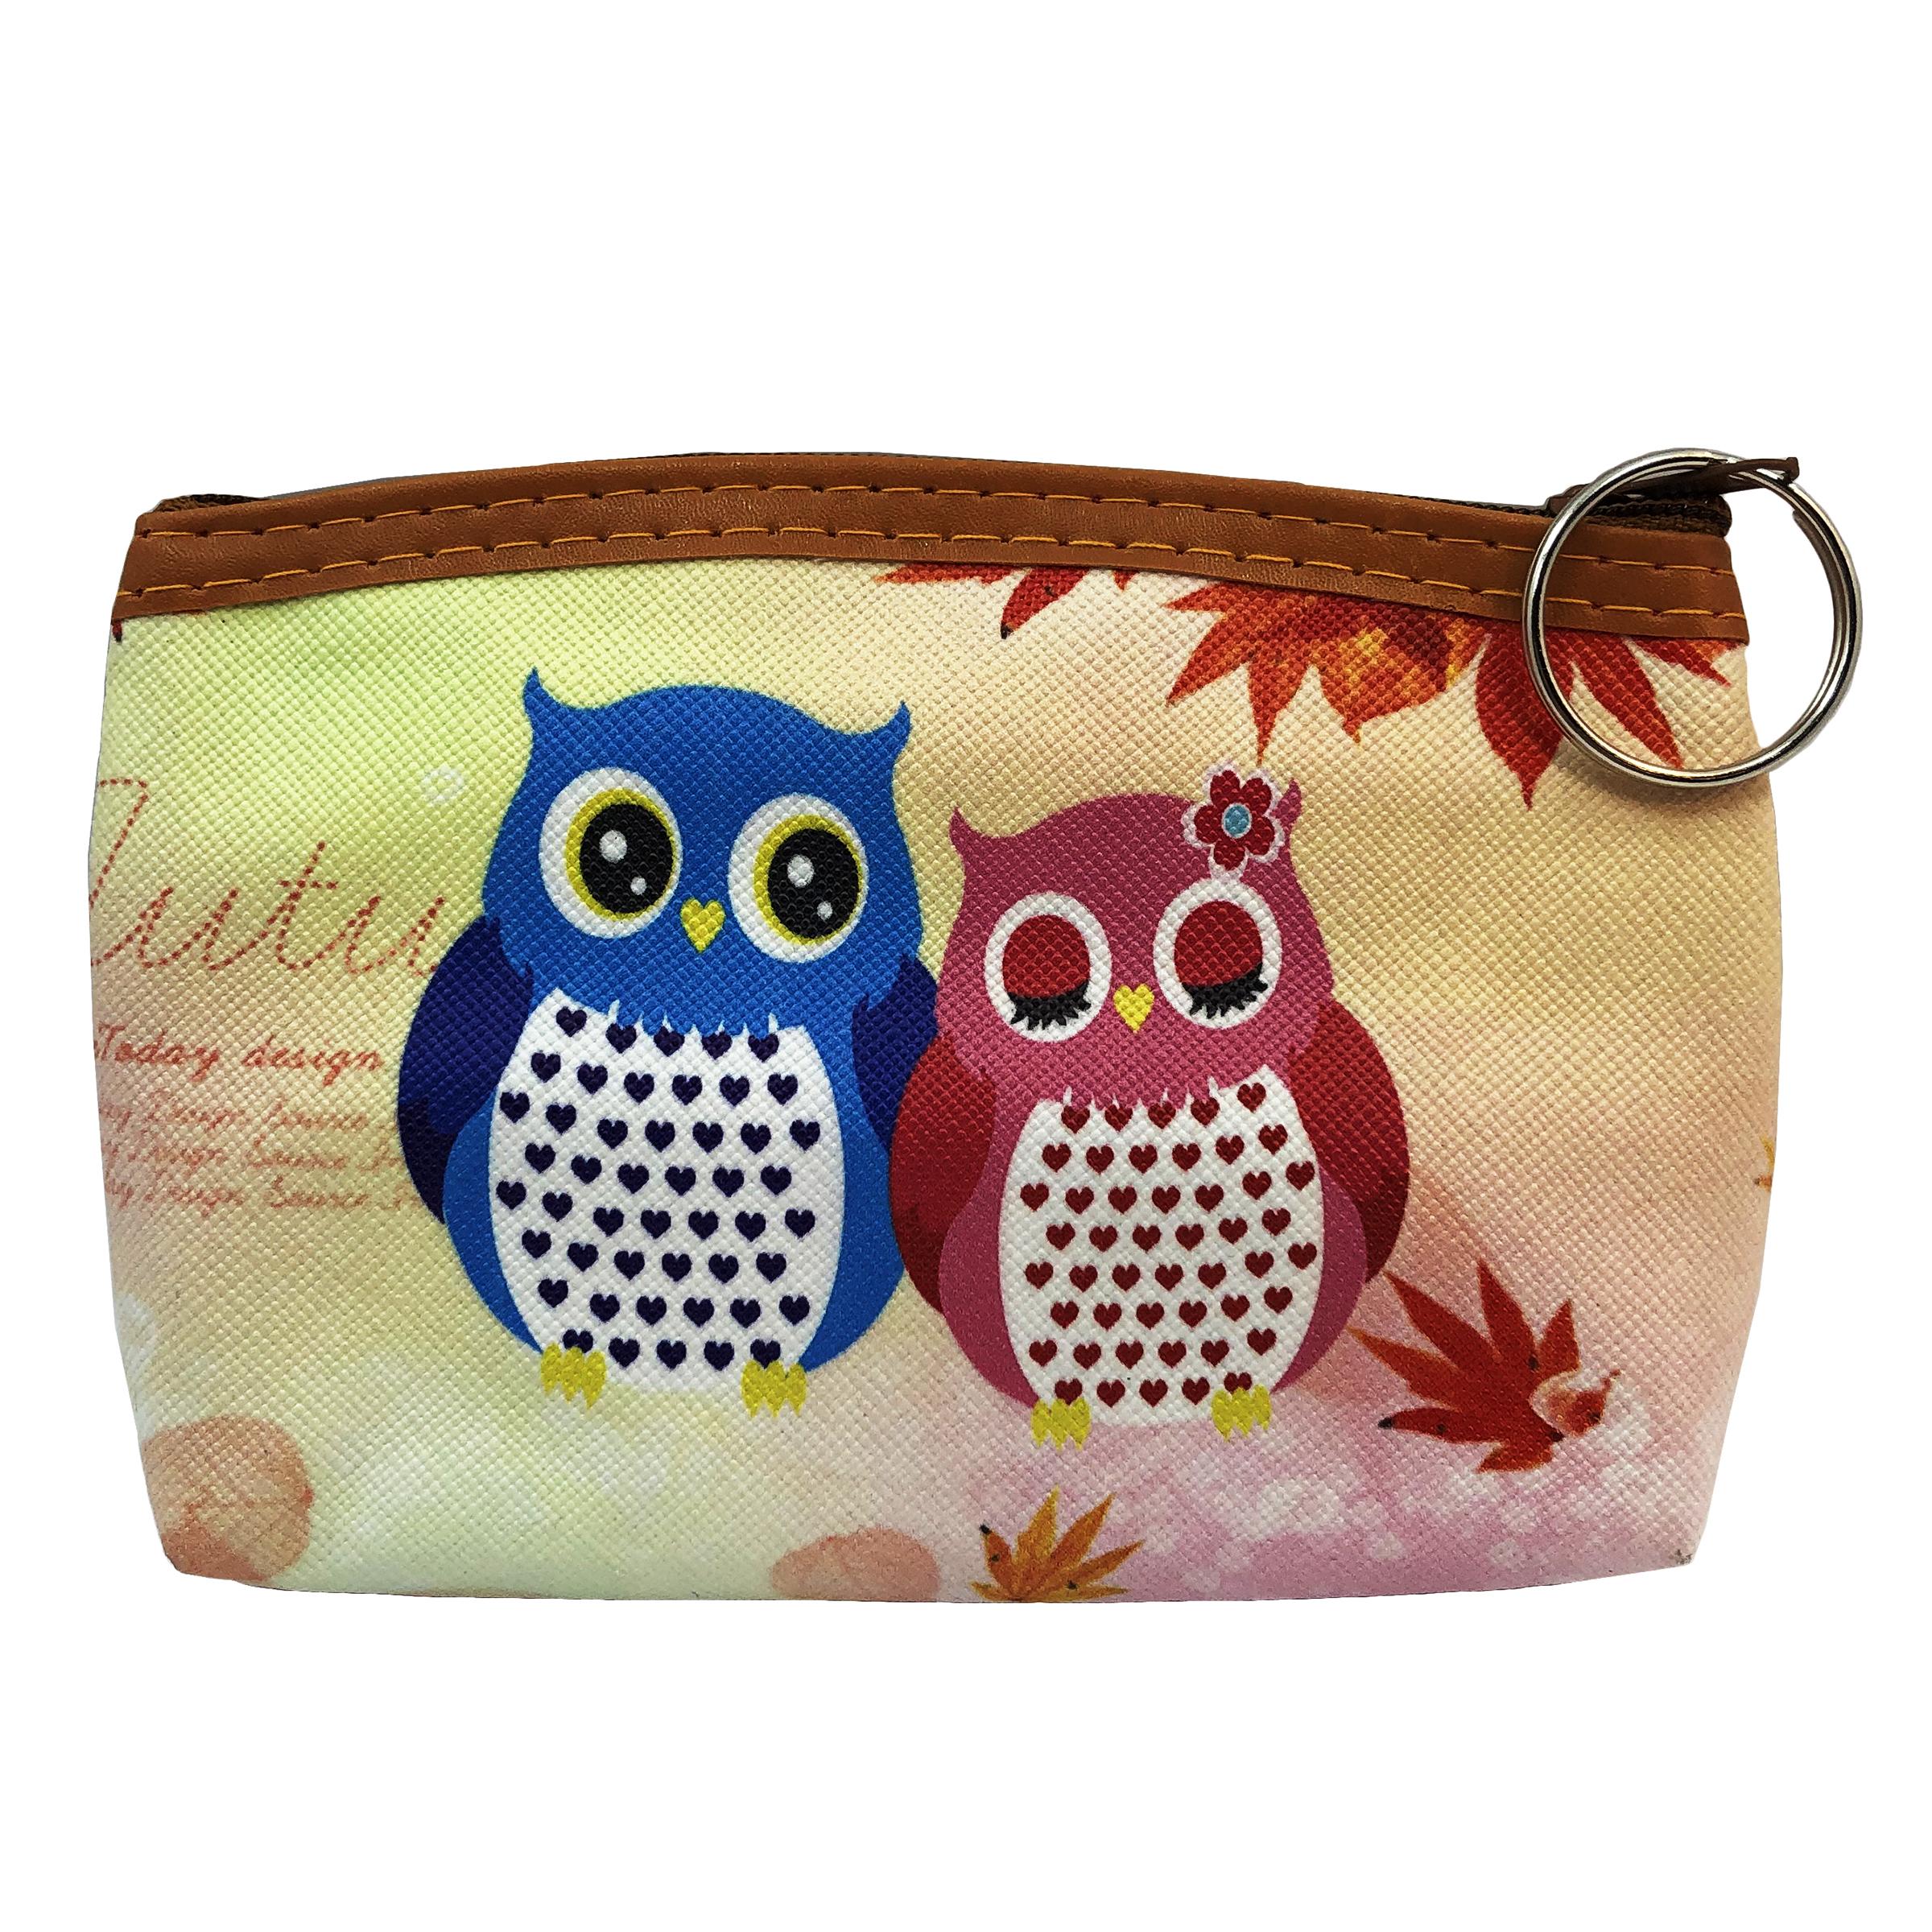 کیف پول دخترانه طرح Owls Couple